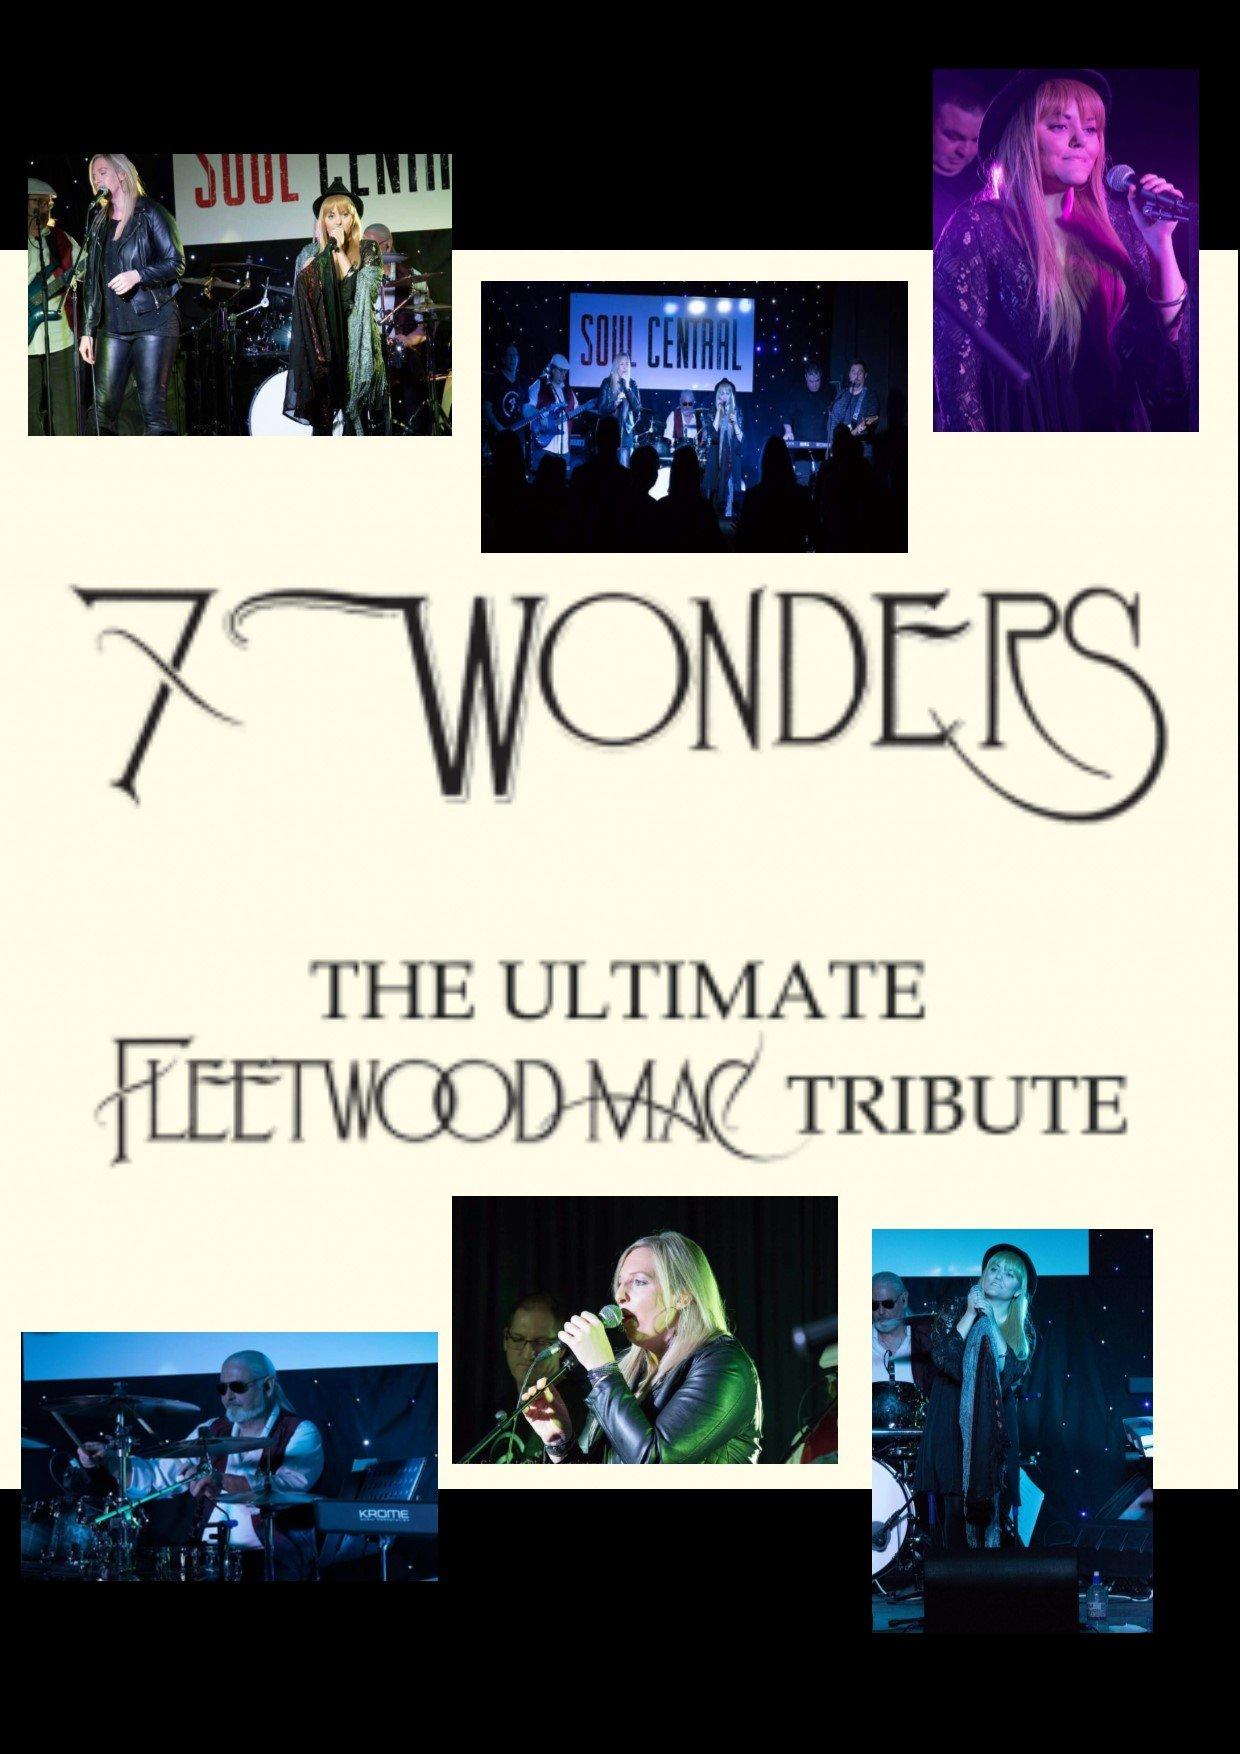 7 WONDERS FLEETWOOD MAC TRIBUTE